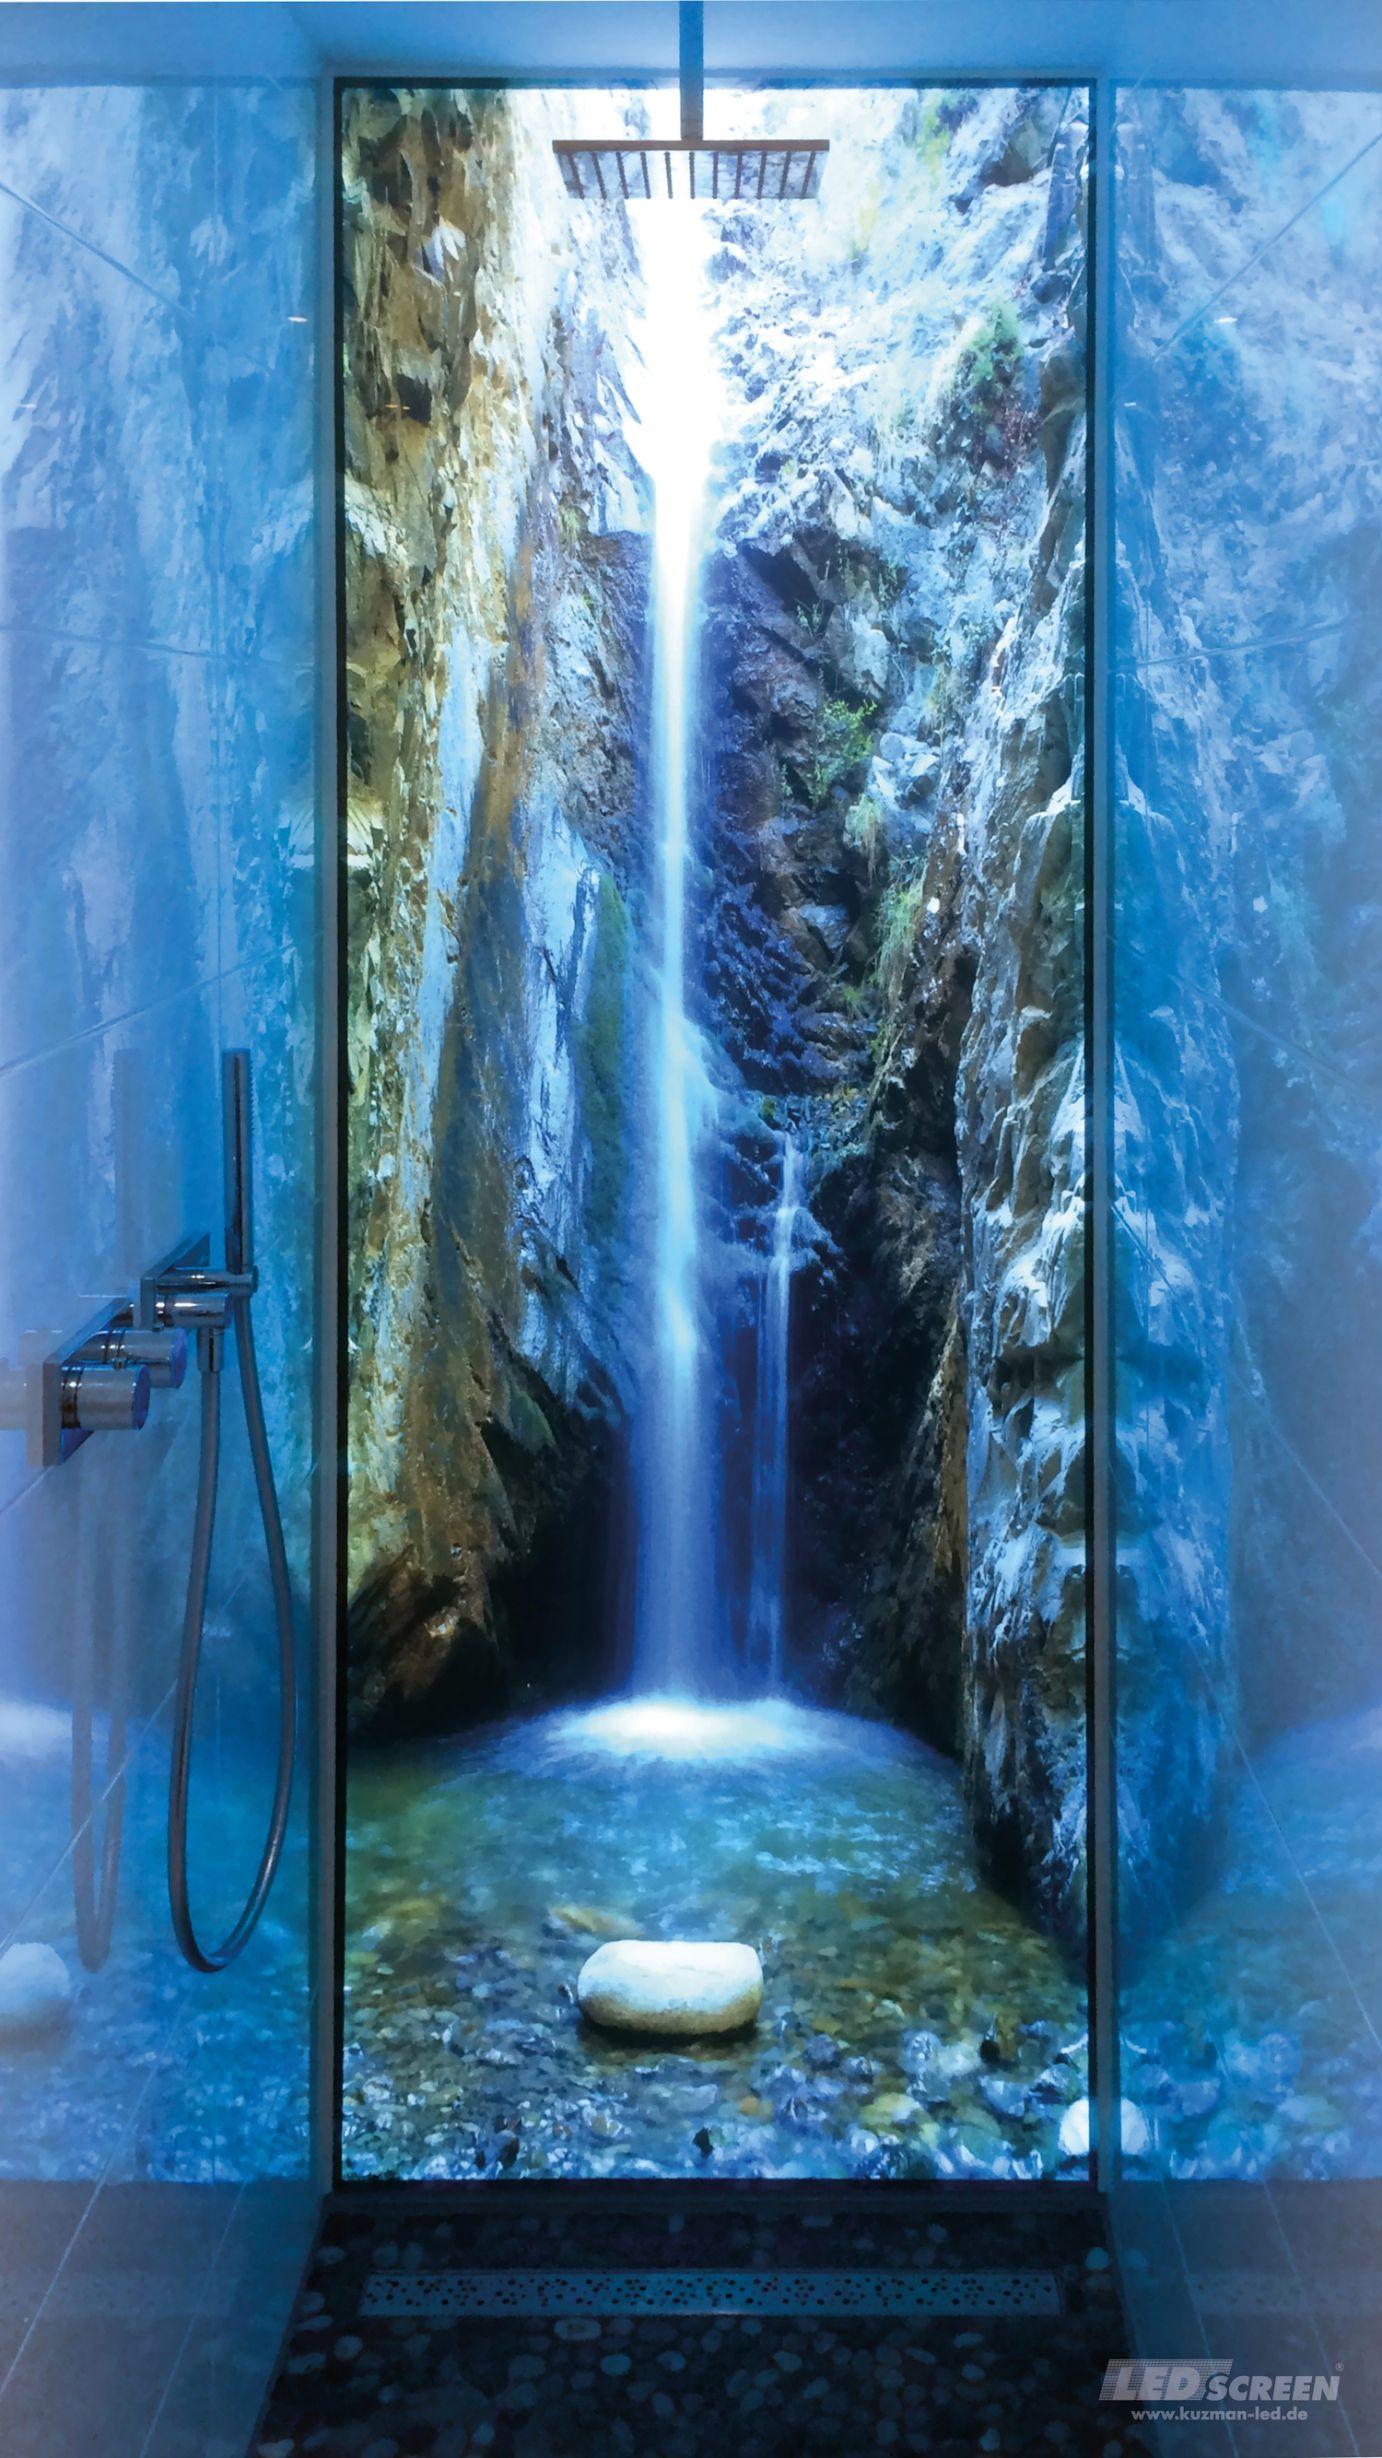 Badezimmer WAND STICKER MEERJUNGFRAU wand abziehbilder Duschabtrennung Aufkleber